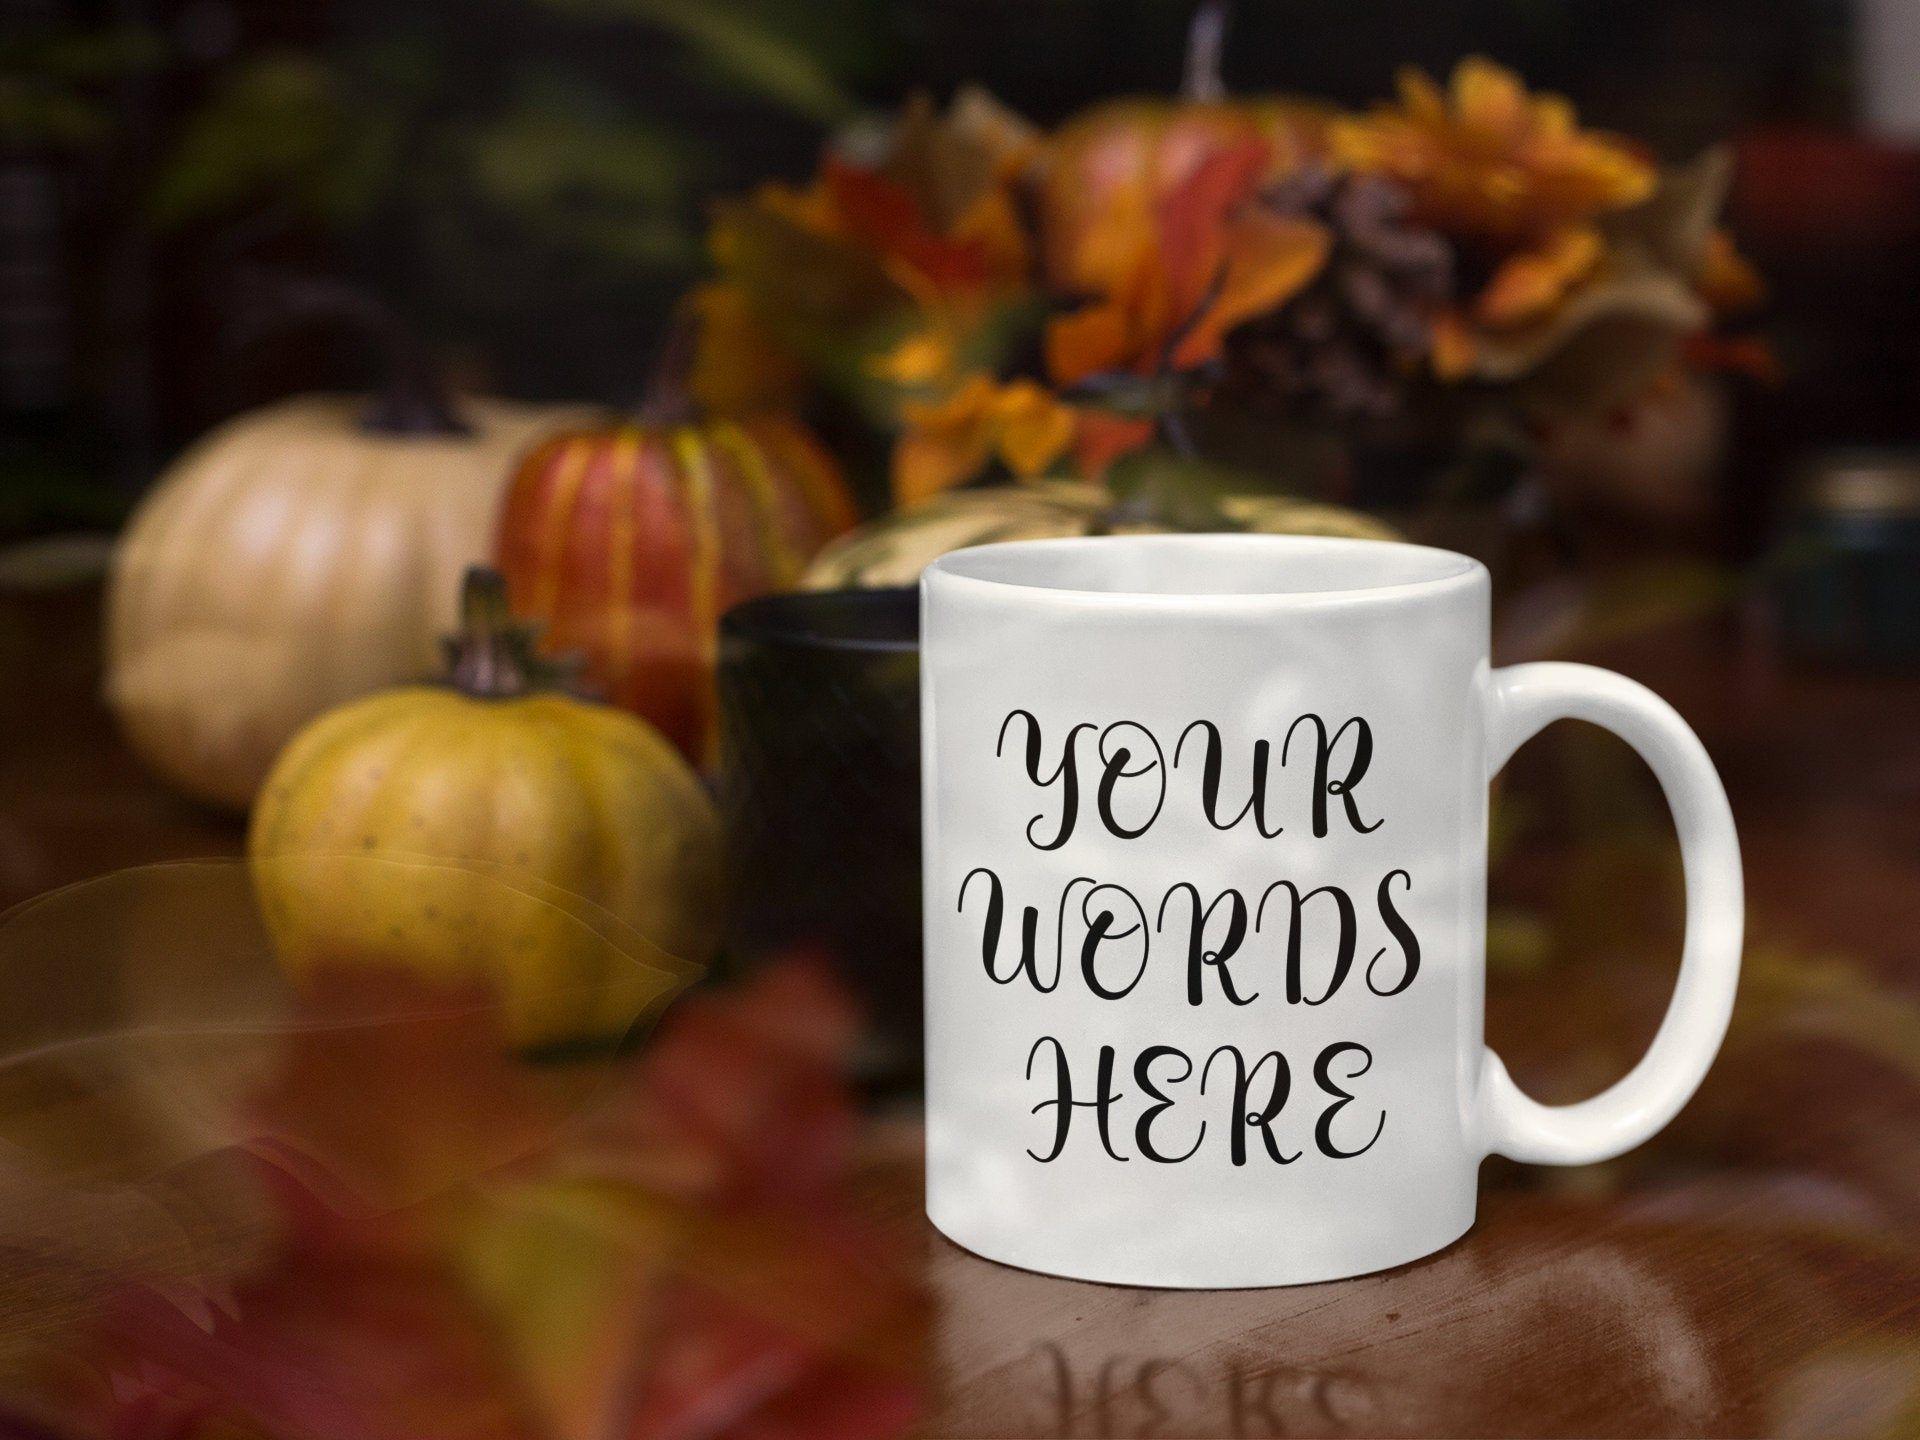 Custom Mug - Coffee mug Gift - Personalized Mug - Customized Mug - Unique Mug - Coffee Cup - Mugs - Right & Left Print Mug - Dishwasher Safe #custommugs